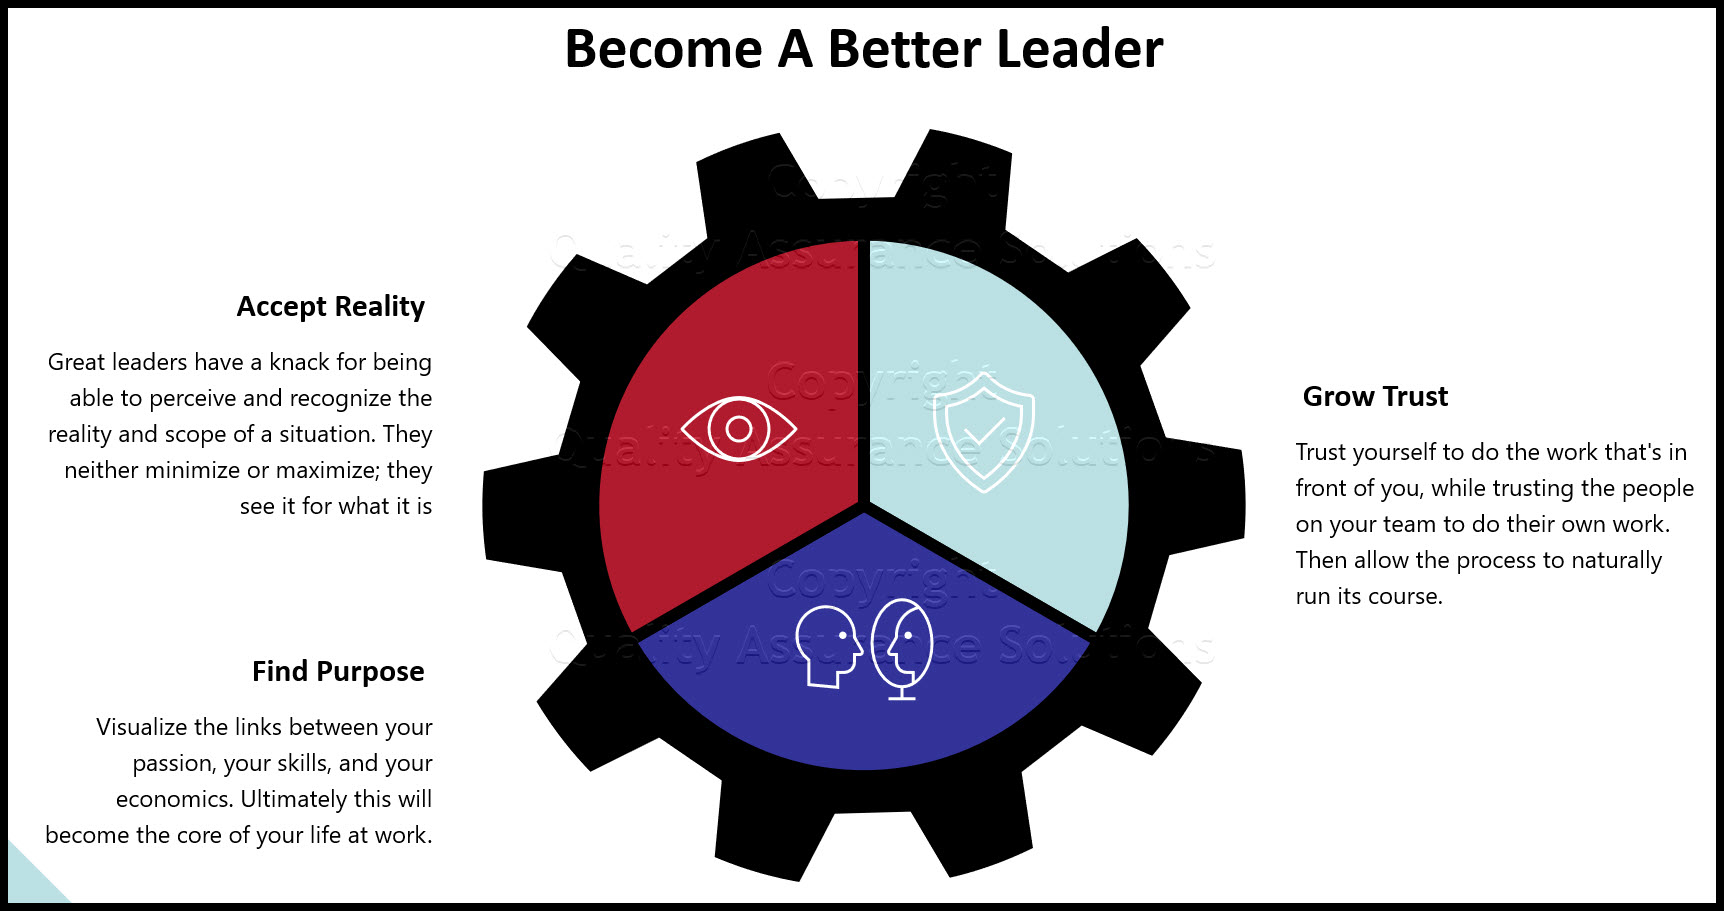 Becoming a Better Leader slide